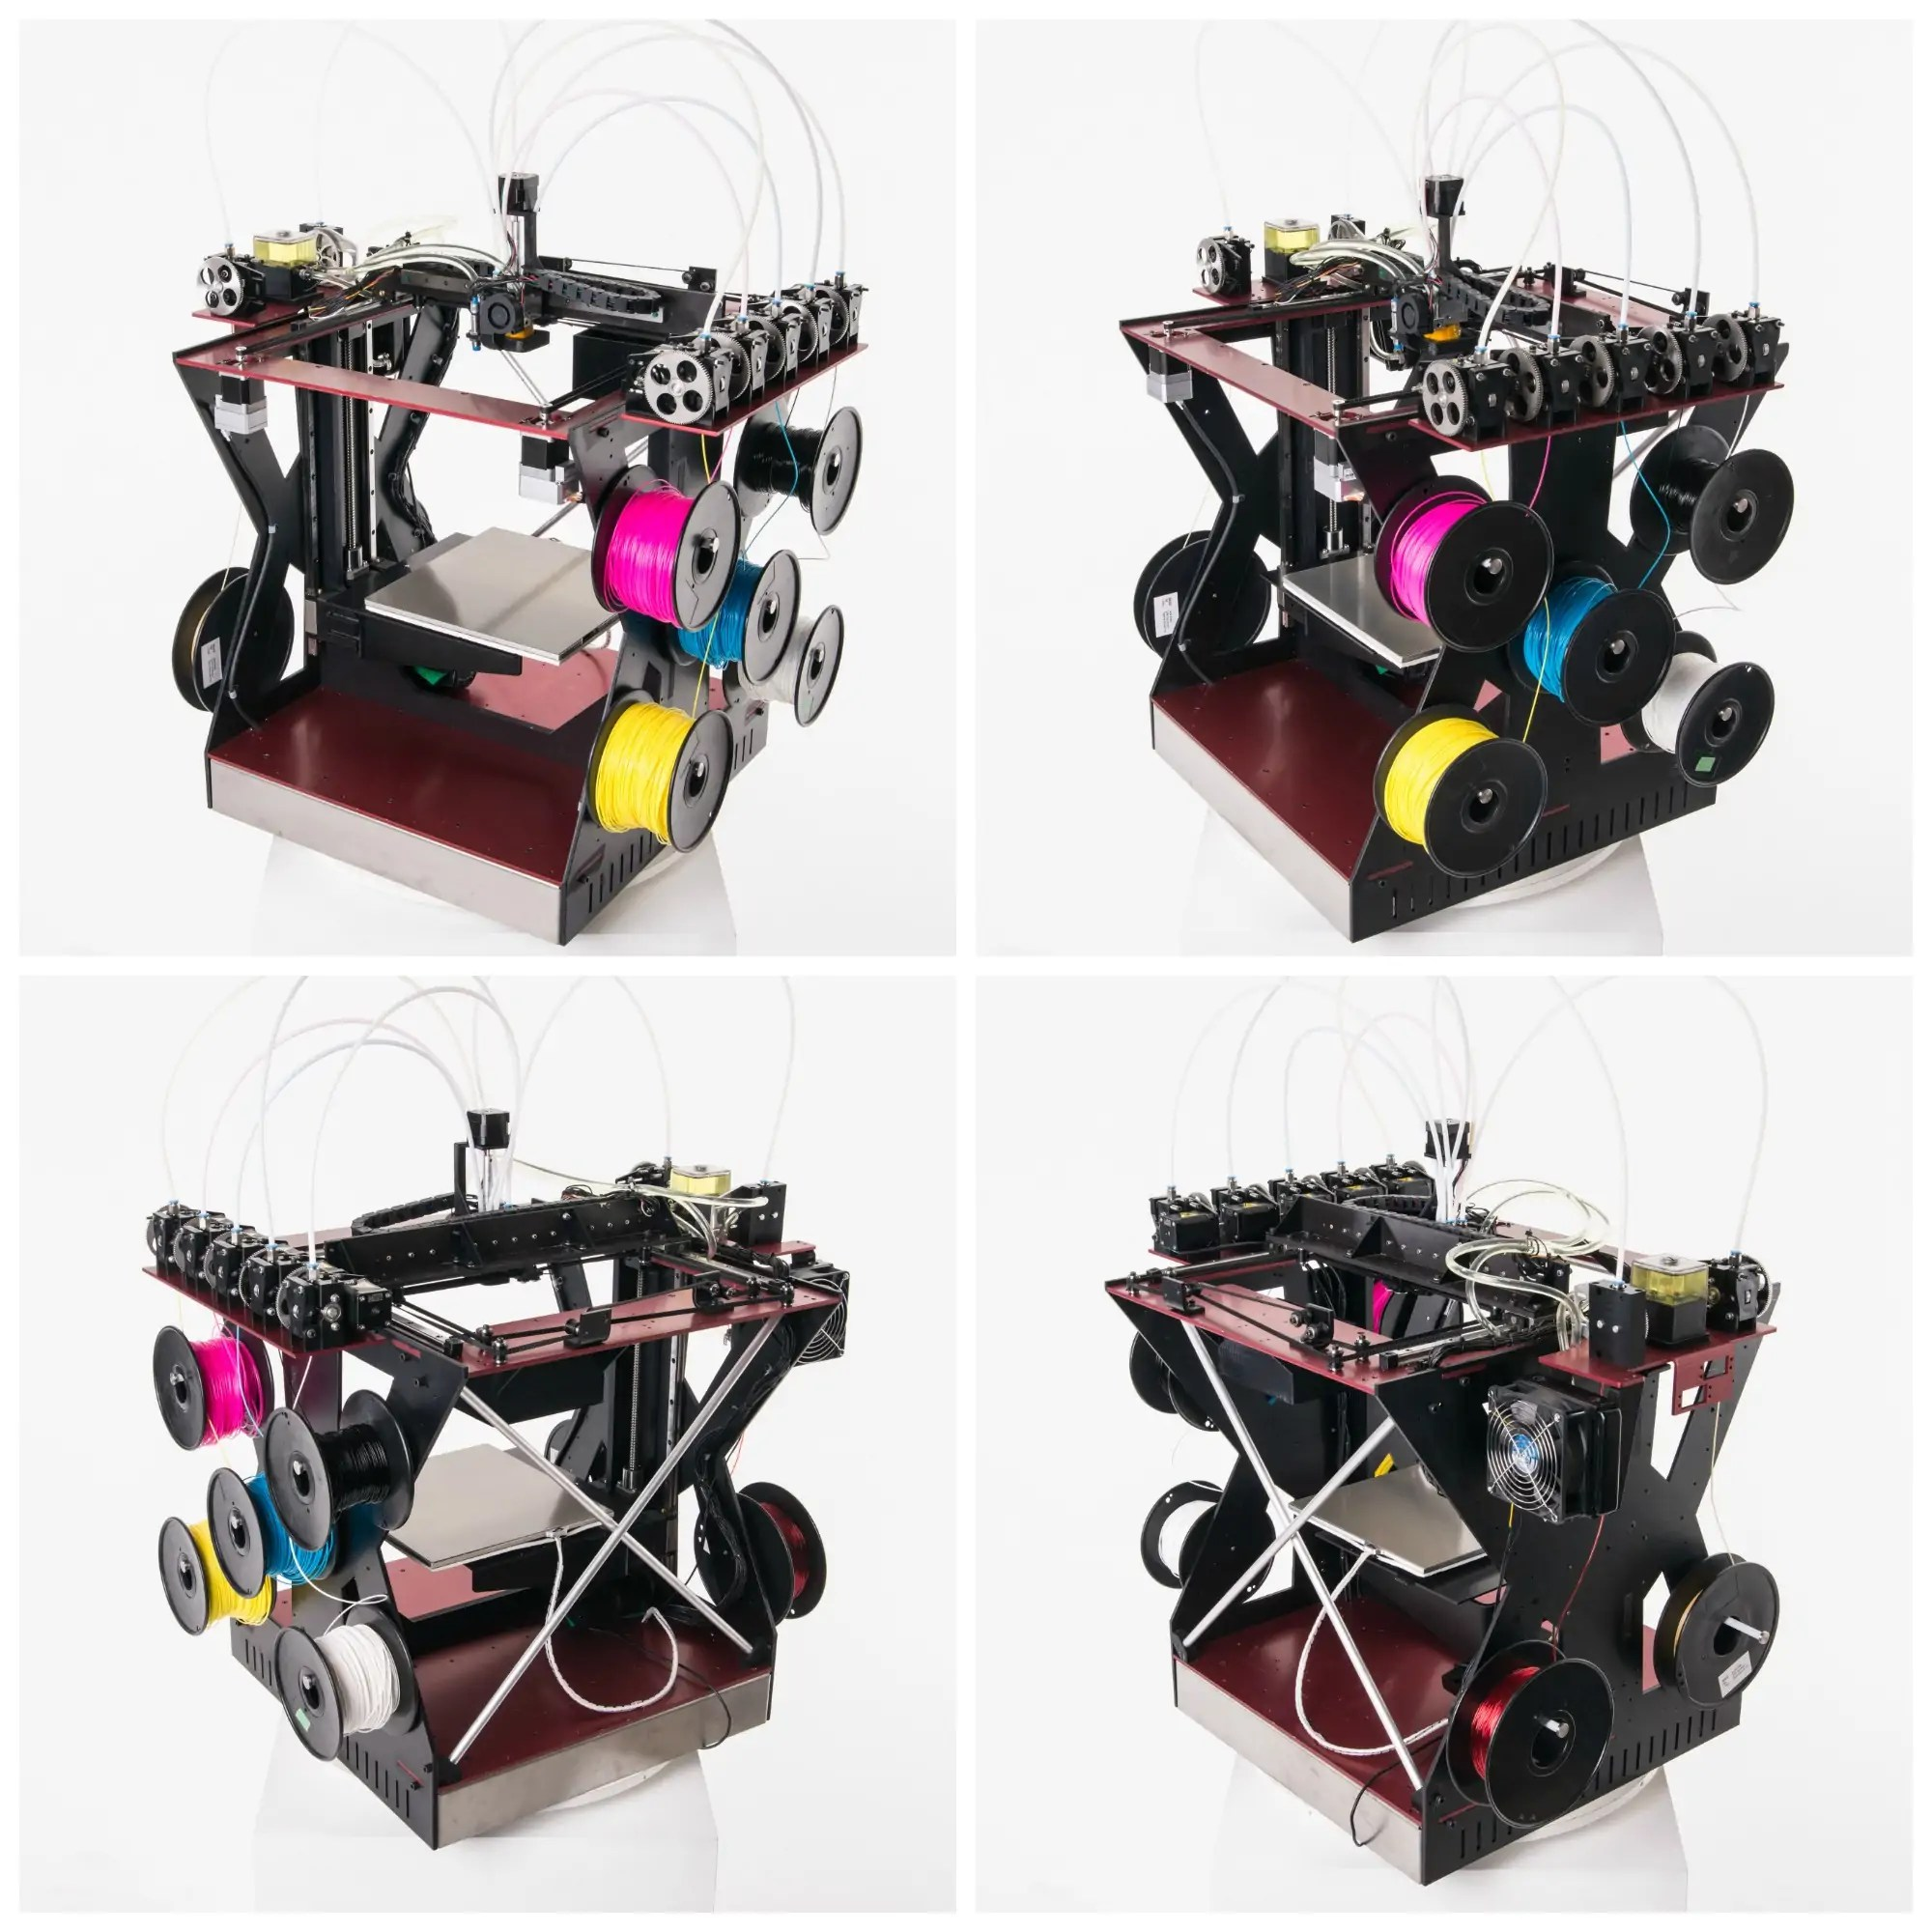 The Rova4D Is The Color Blending 3D Printer We've Always